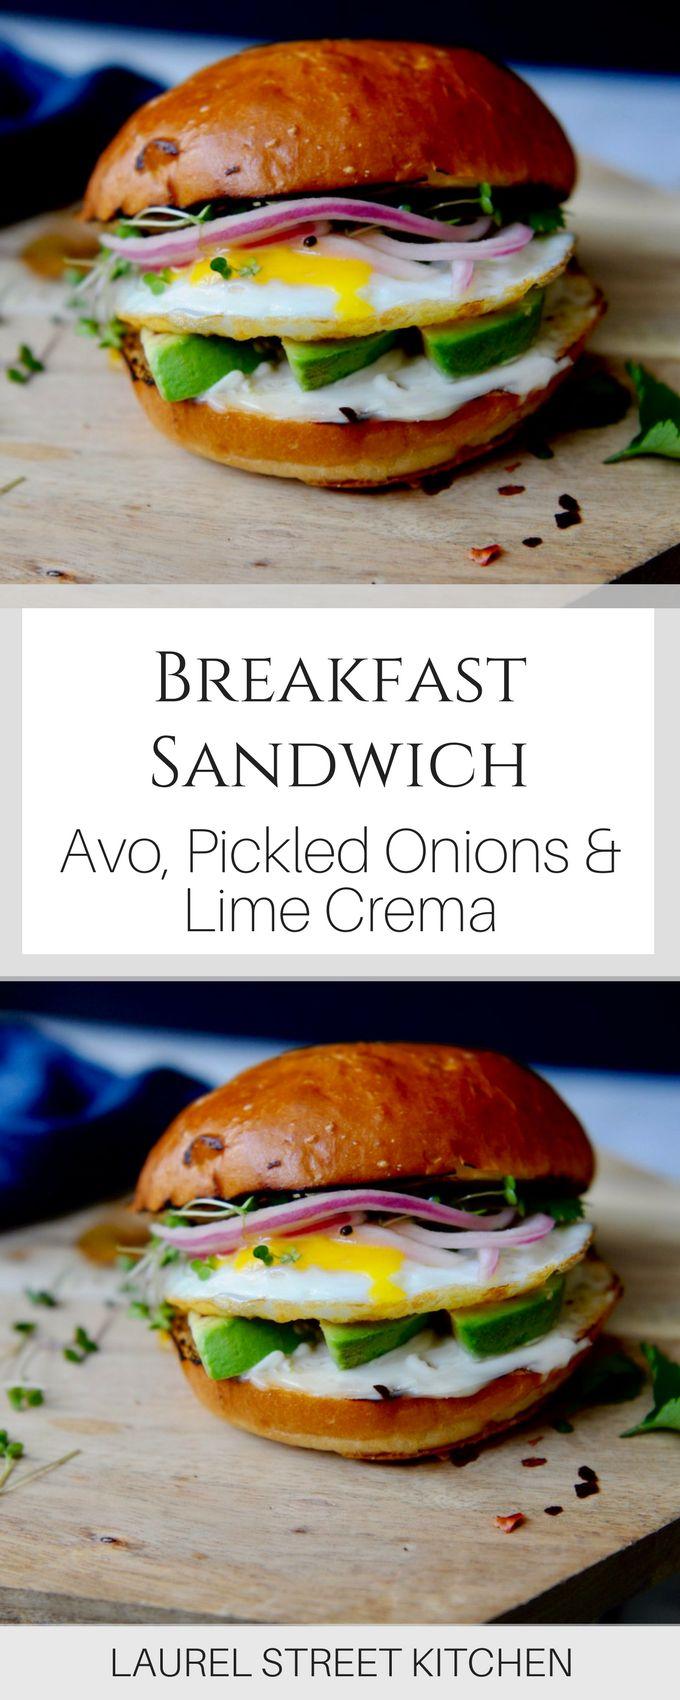 100+ Avocado Sandwich Recipes on Pinterest | Avacado ...